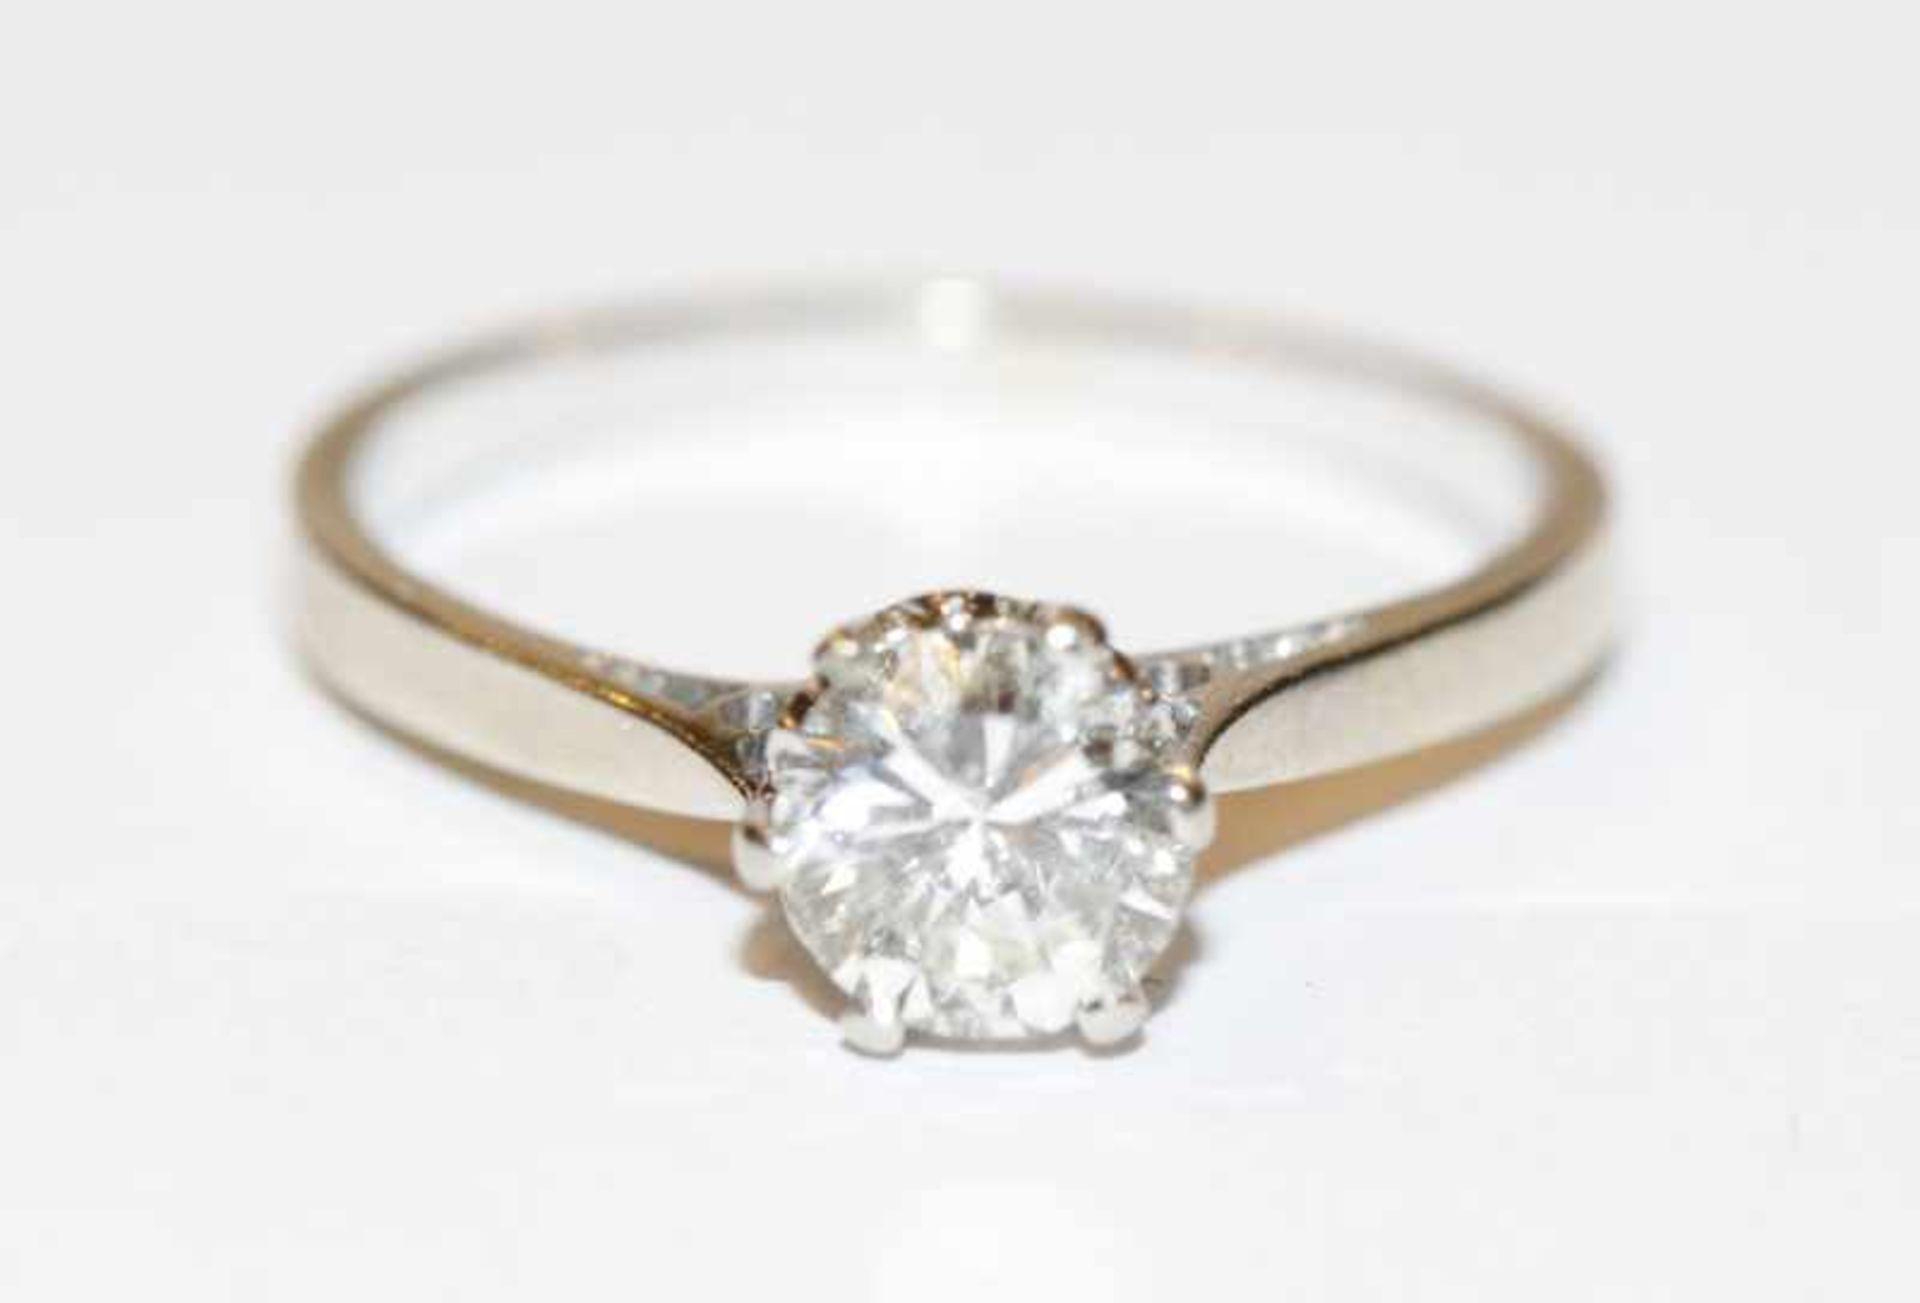 Los 38 - 14 k Weißgold Solitär Diamantring, ca. 0,75 ct. w/si, Gr. 54